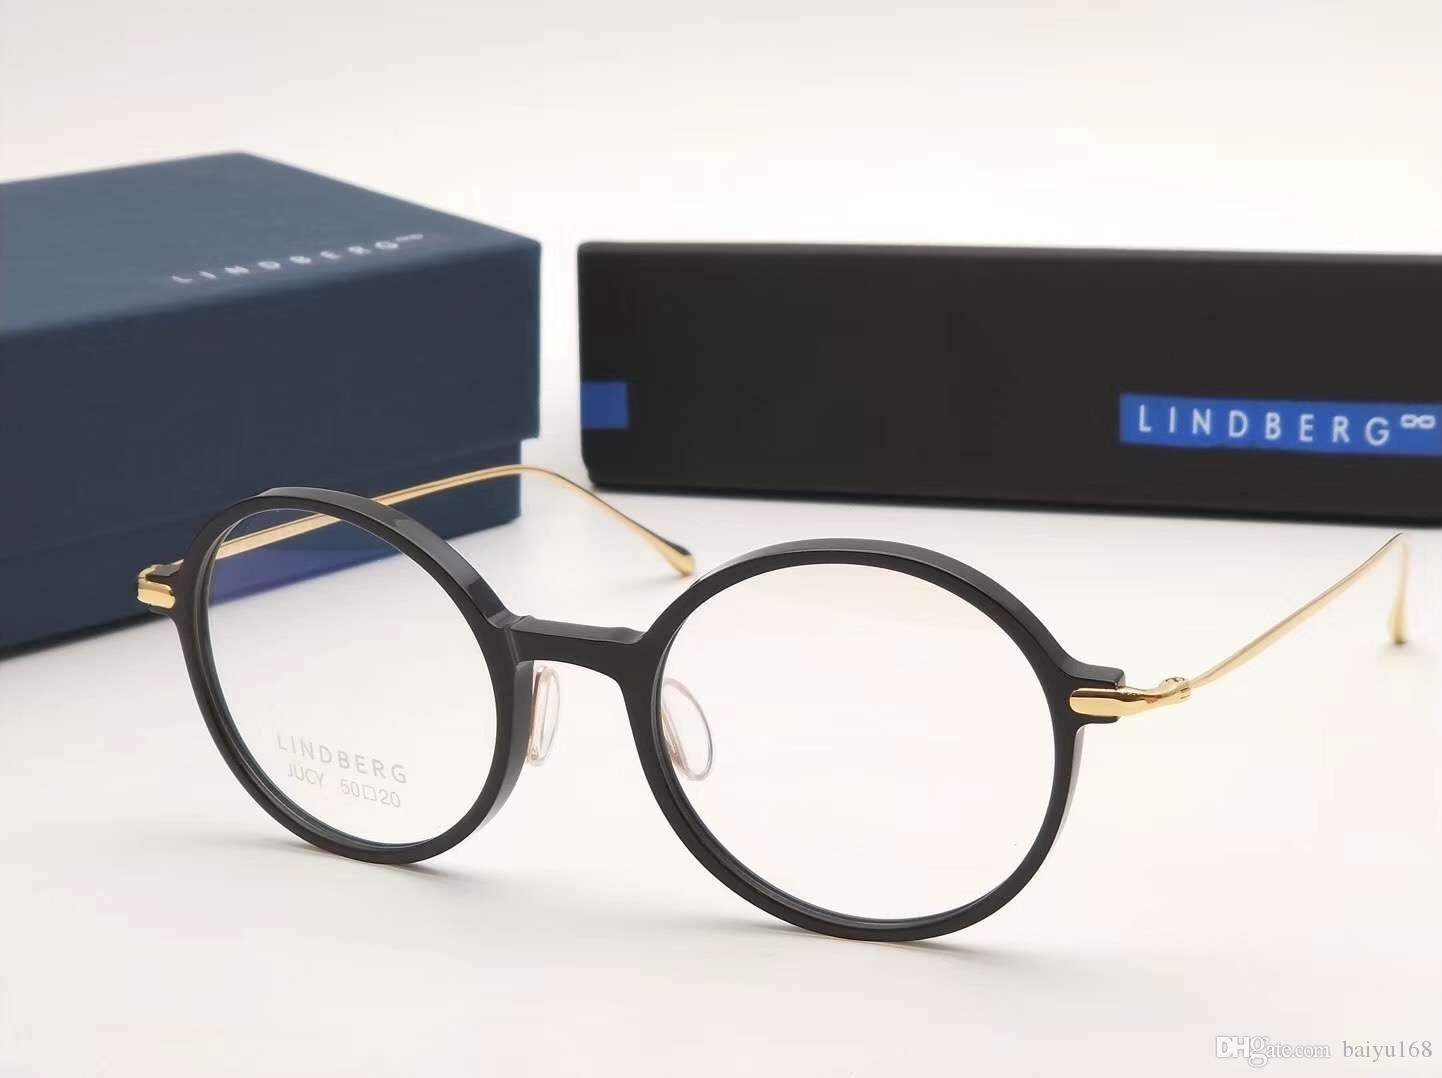 Compre Lindberg Jucy Gafas Redondas De Titanio Gafas Negro Gafas De ...